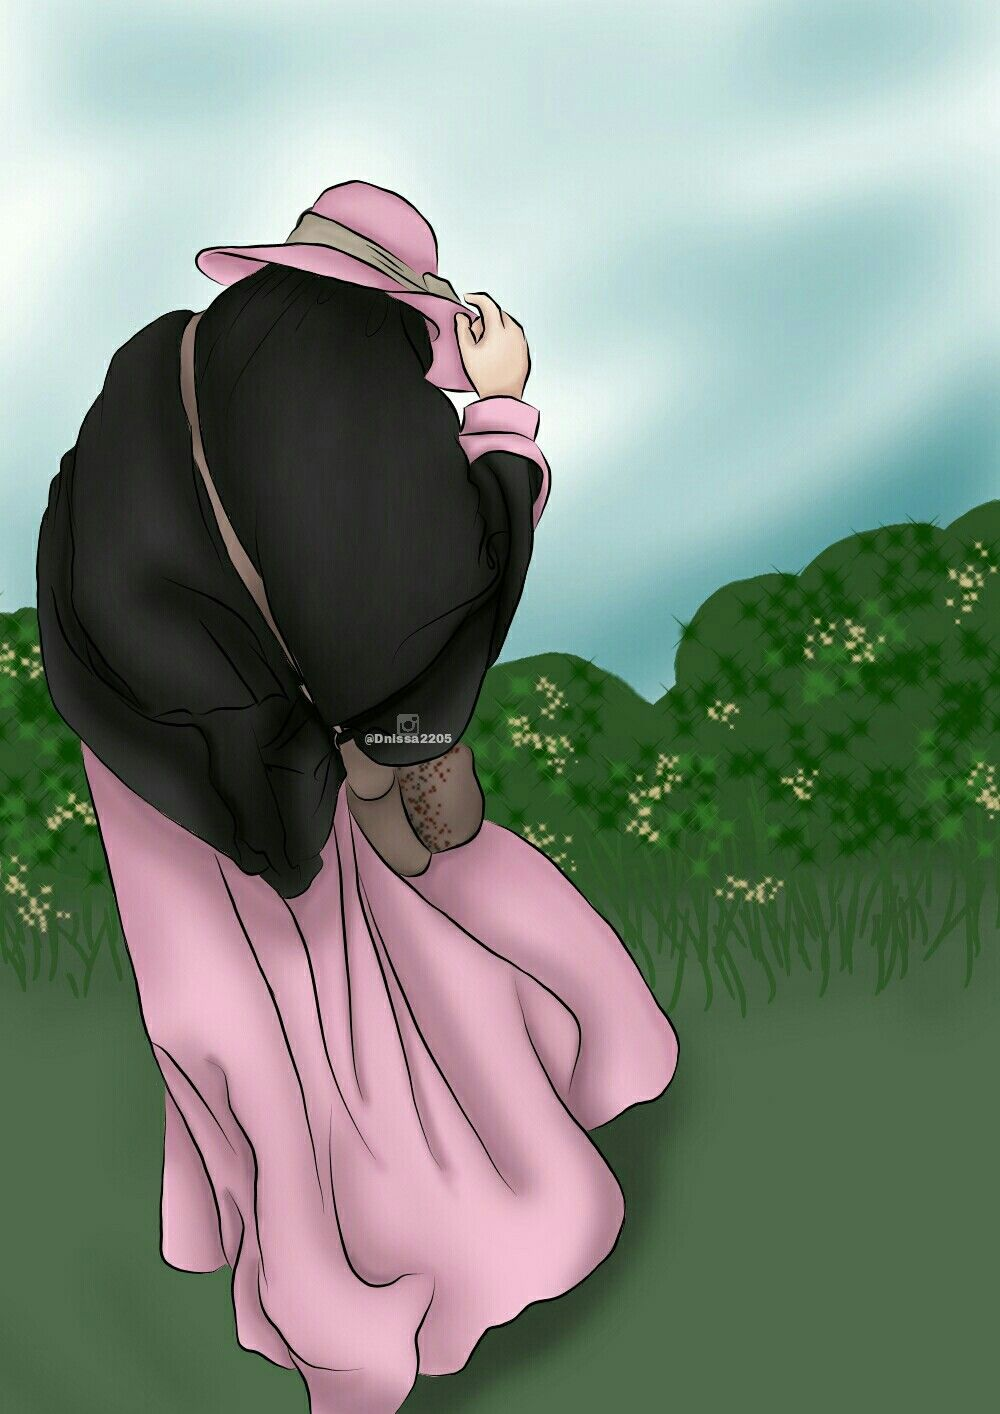 Pin oleh Dnissa2205 di Doodlemuslimah Kartun, Animasi, Seni